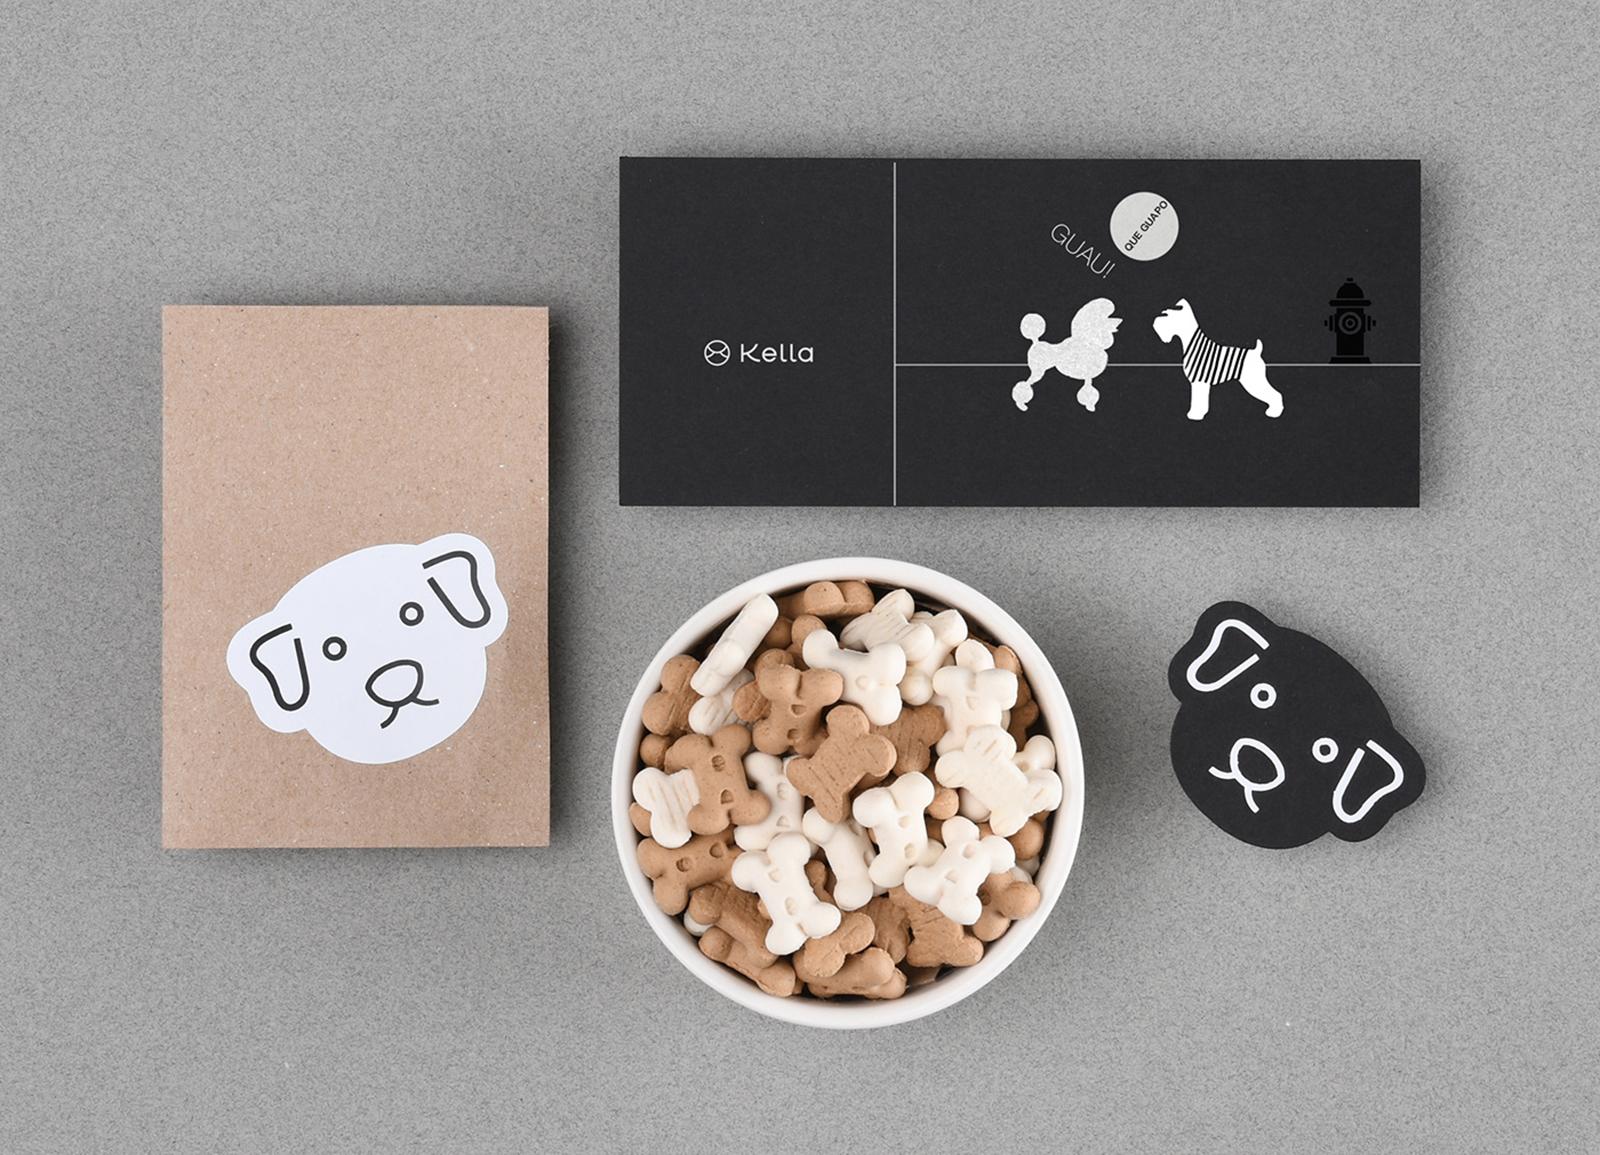 Kella宠物食品品牌视觉VI形象设计欣赏-深圳VI设计12